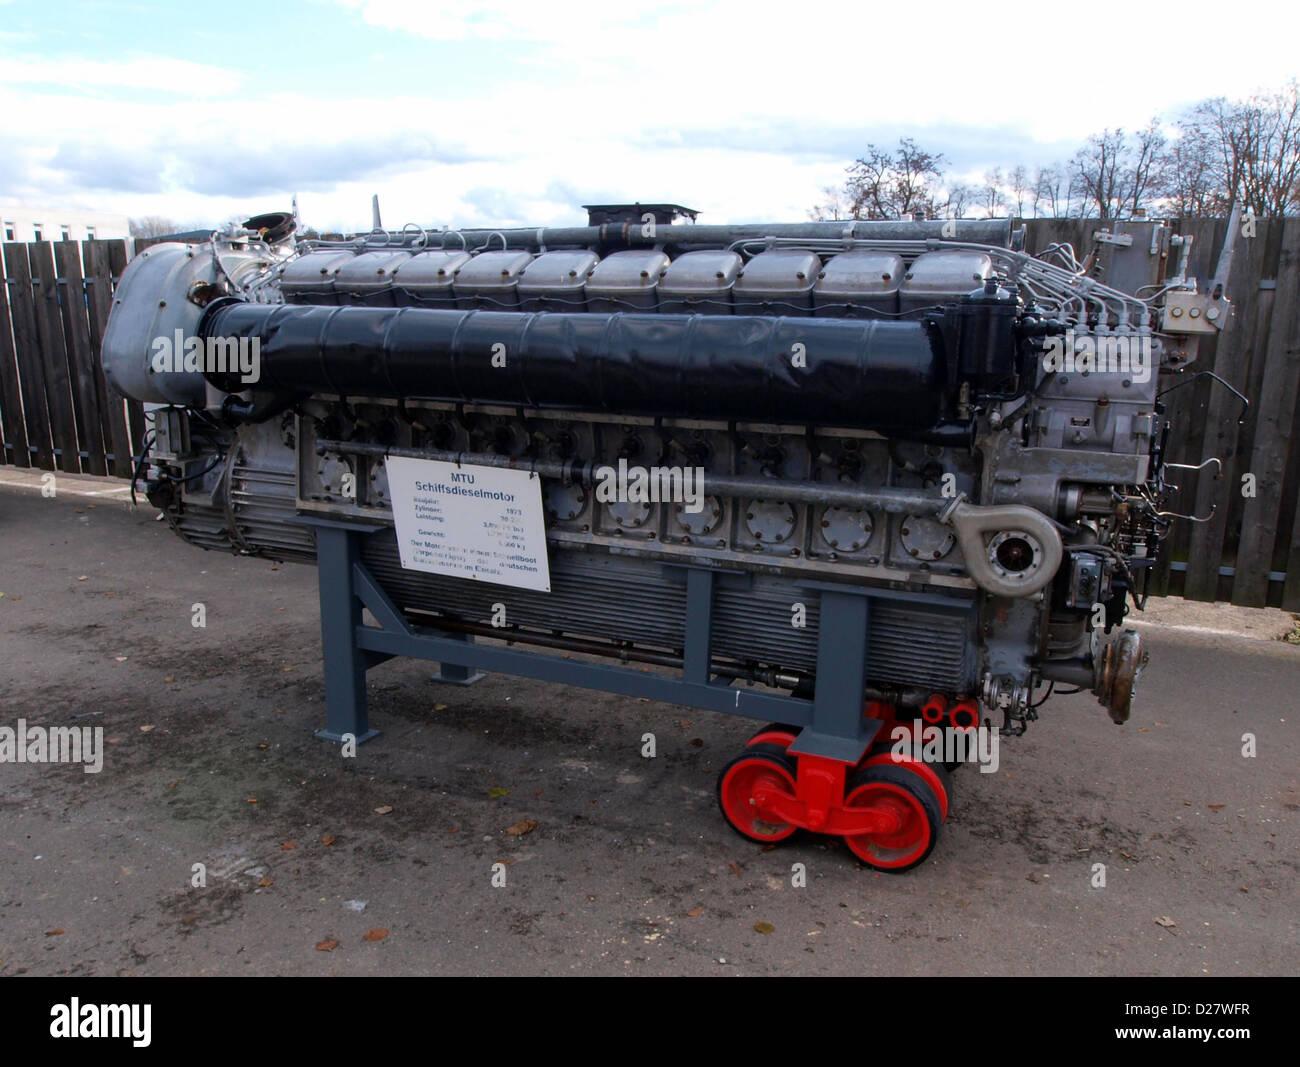 Mtu Engine Stock Photos & Mtu Engine Stock Images - Alamy